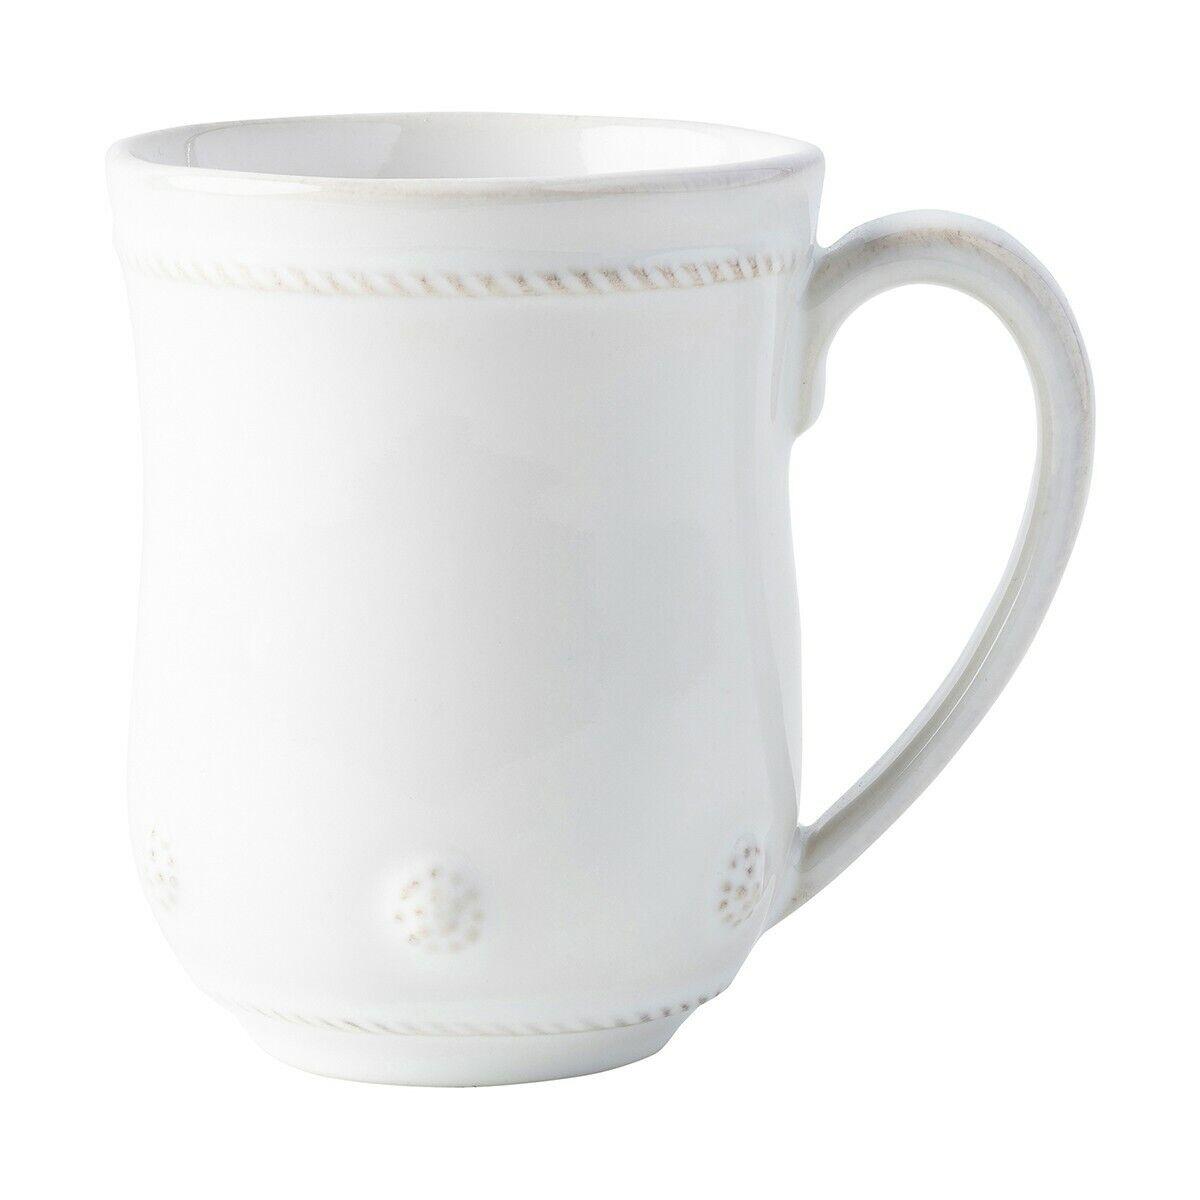 Juliska Berry & Thread blancwash-Mug-Lot de 8